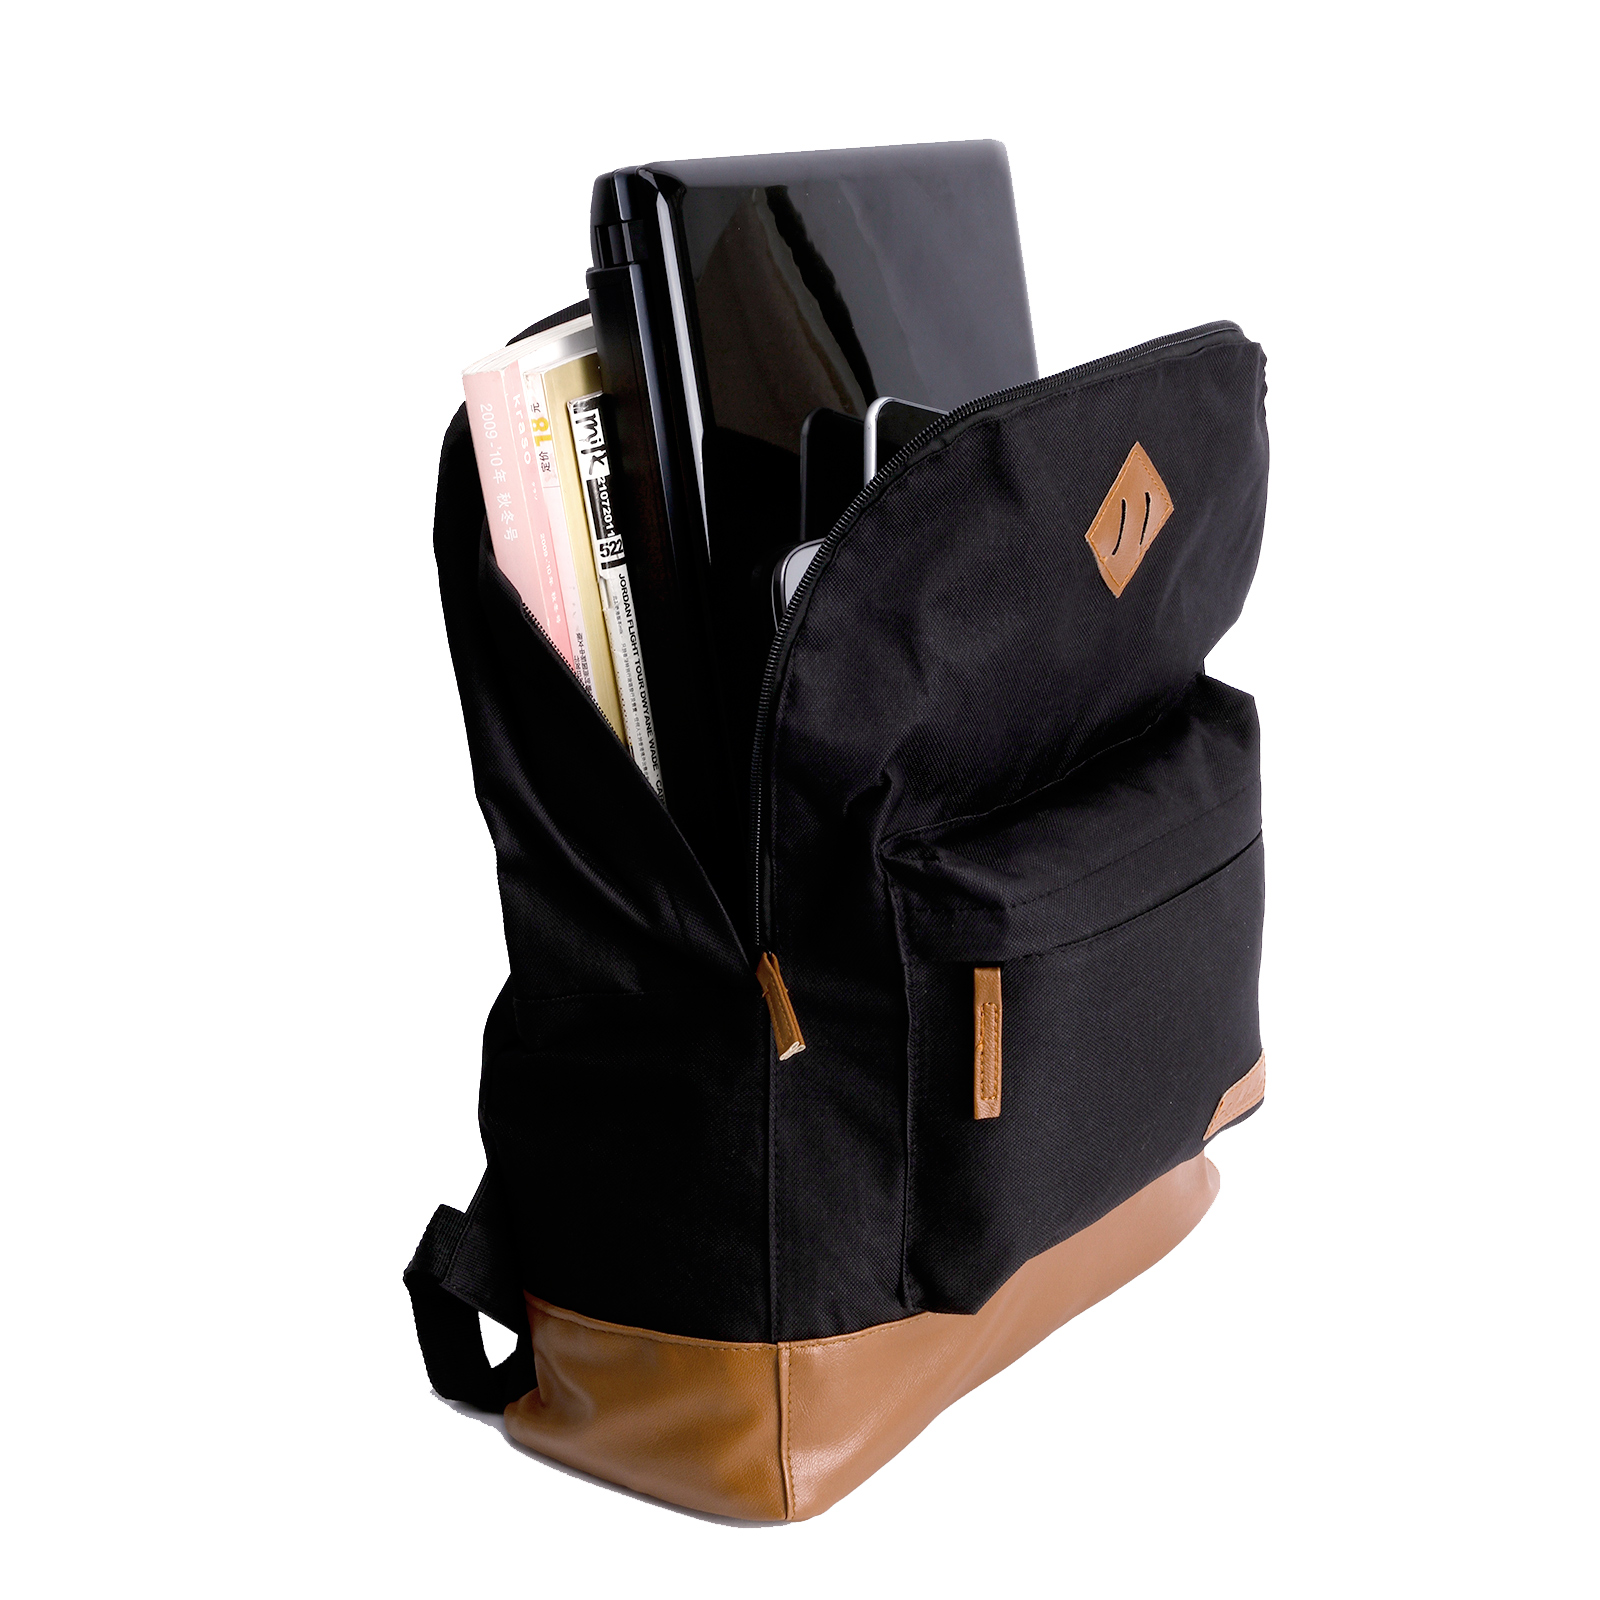 herren damen m dchen rucksack backpack sport schule laptop messenger taschen neu. Black Bedroom Furniture Sets. Home Design Ideas